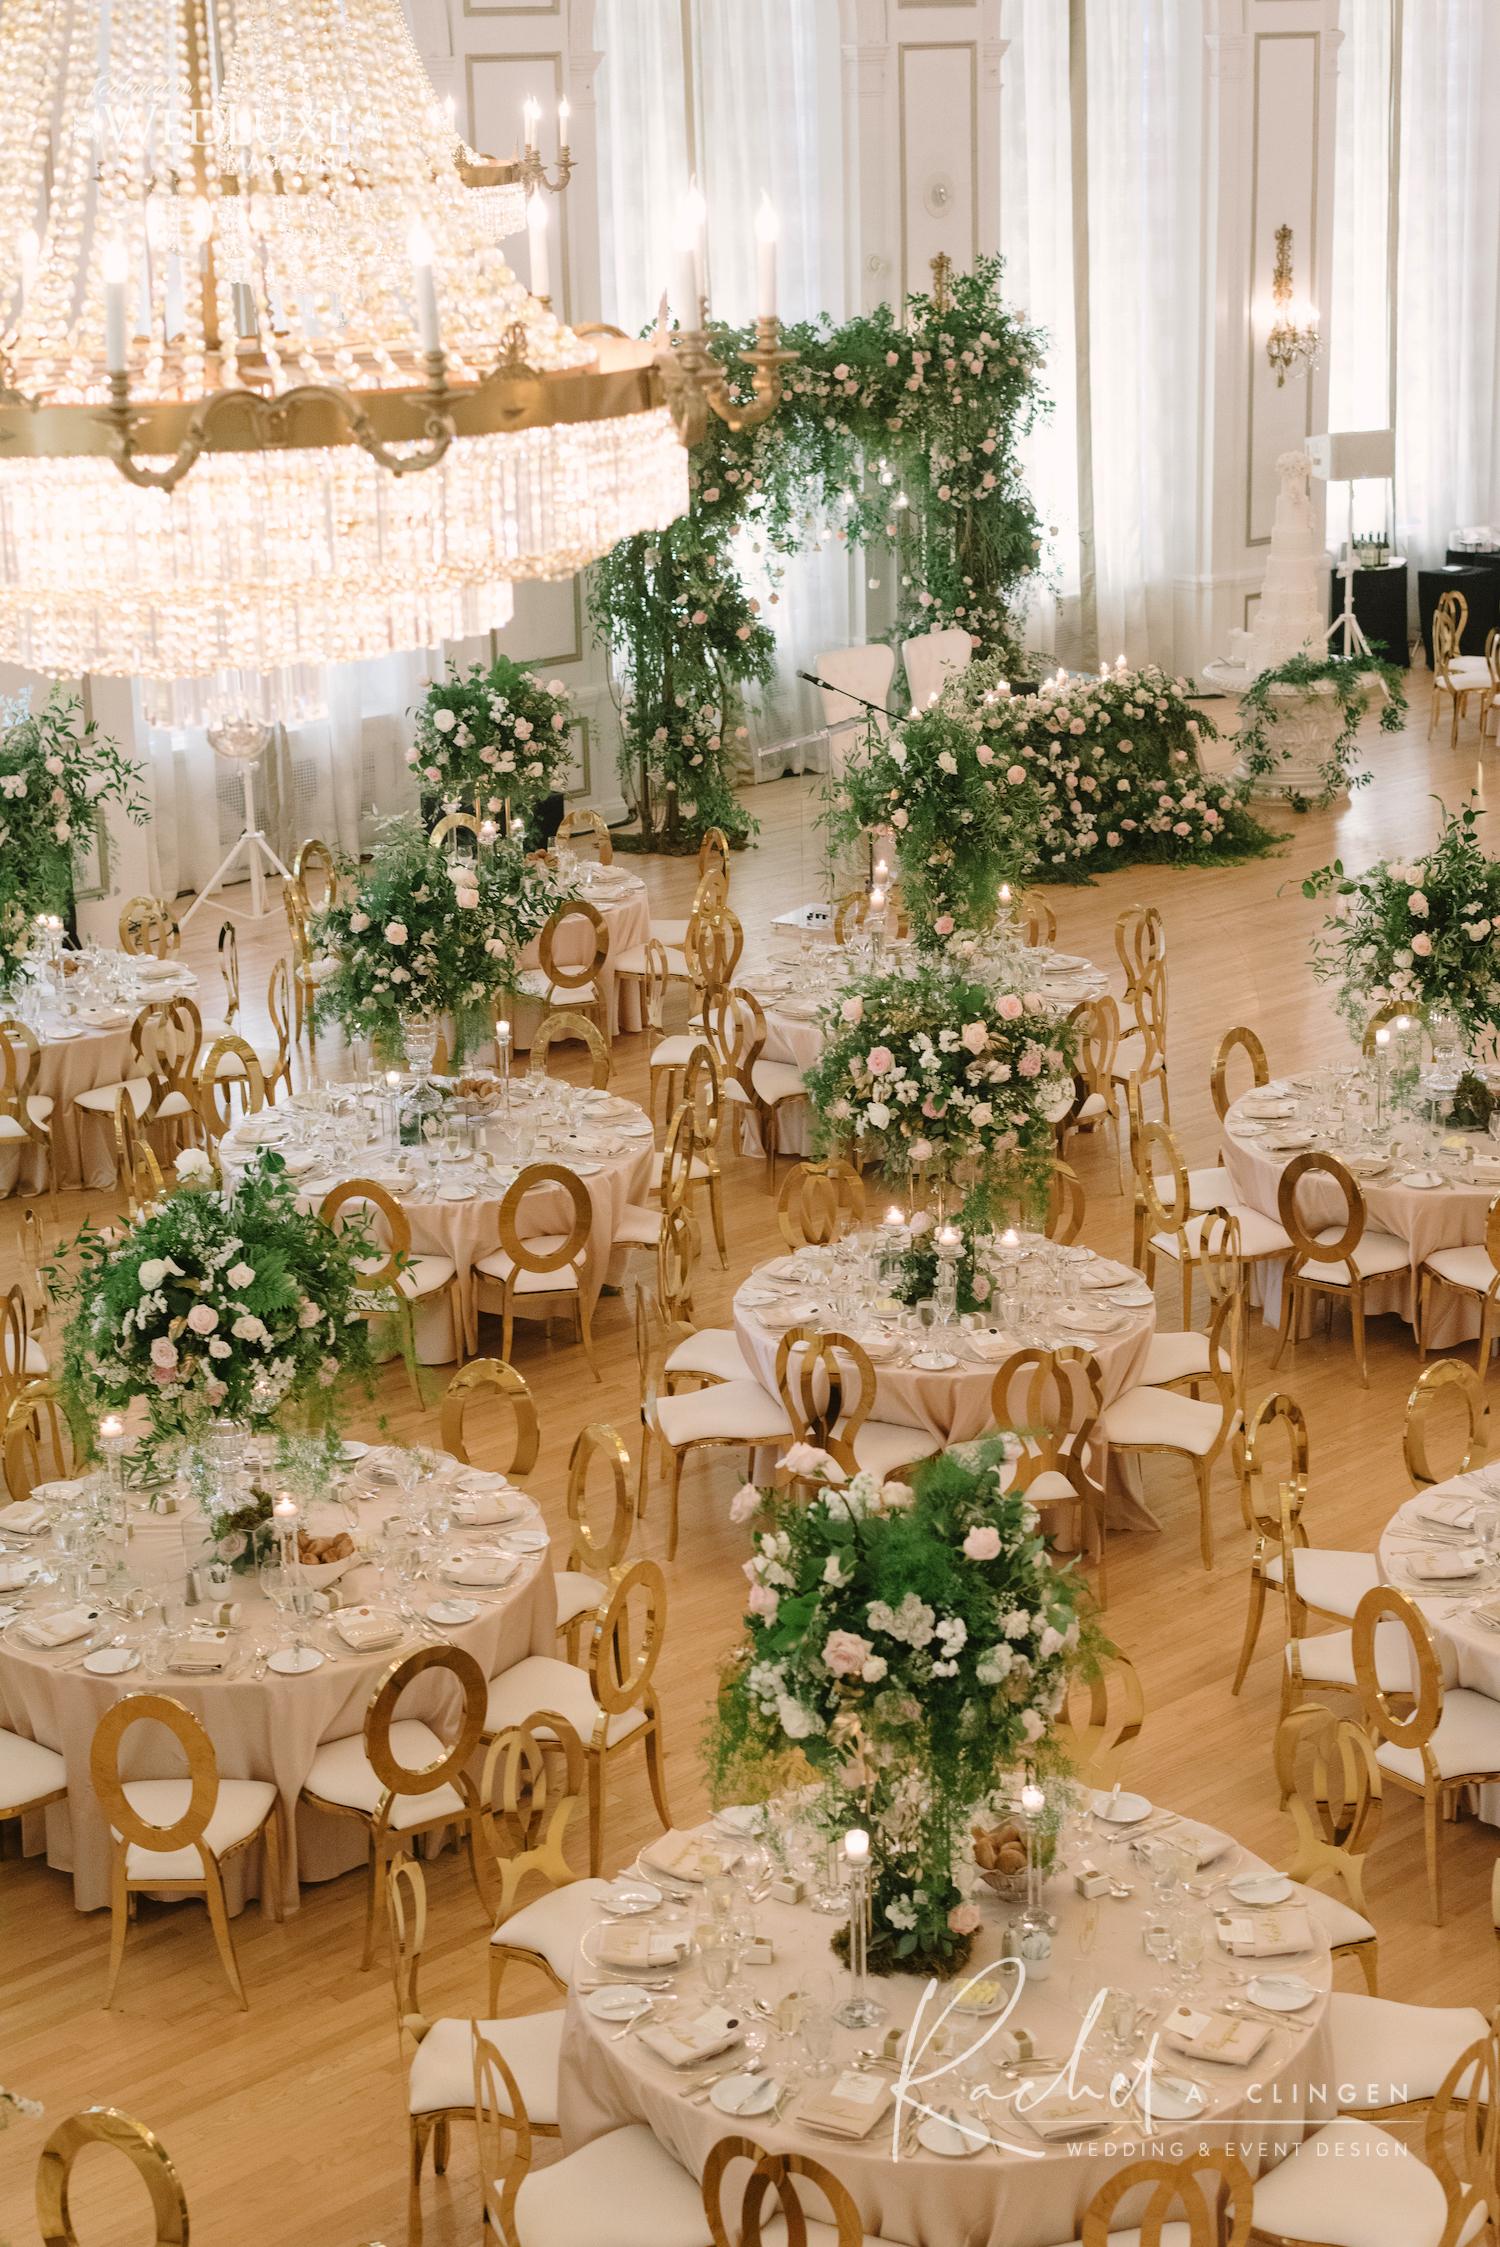 luxury wedding royal york hotel rachel clingen